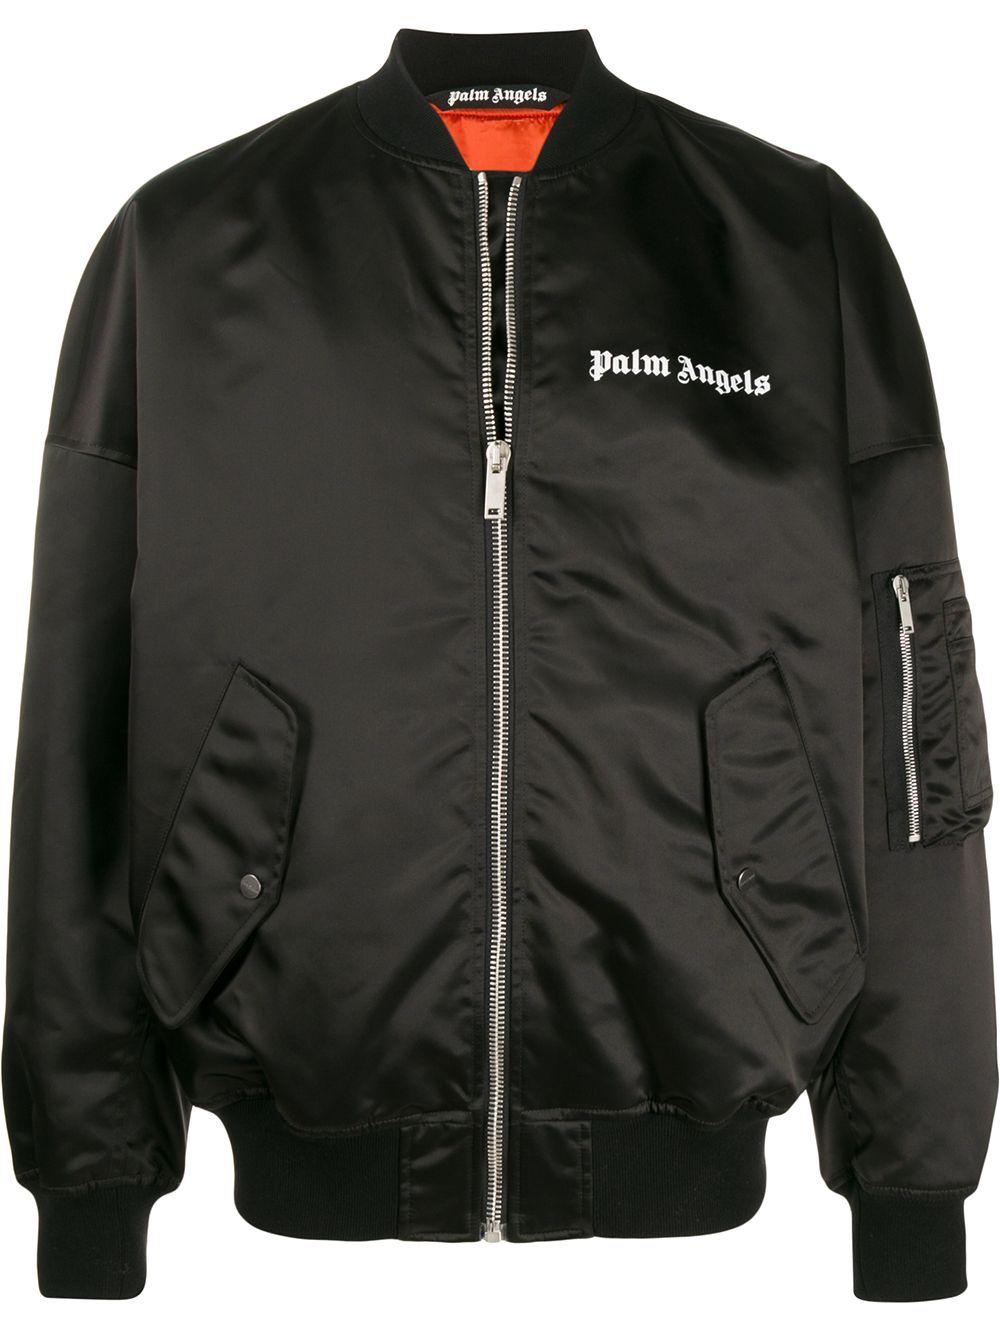 Palm Angels Logo Printed Bomber Jacket Farfetch Bomber Jacket Designer Jackets For Men Printed Bomber Jacket [ 1334 x 1000 Pixel ]